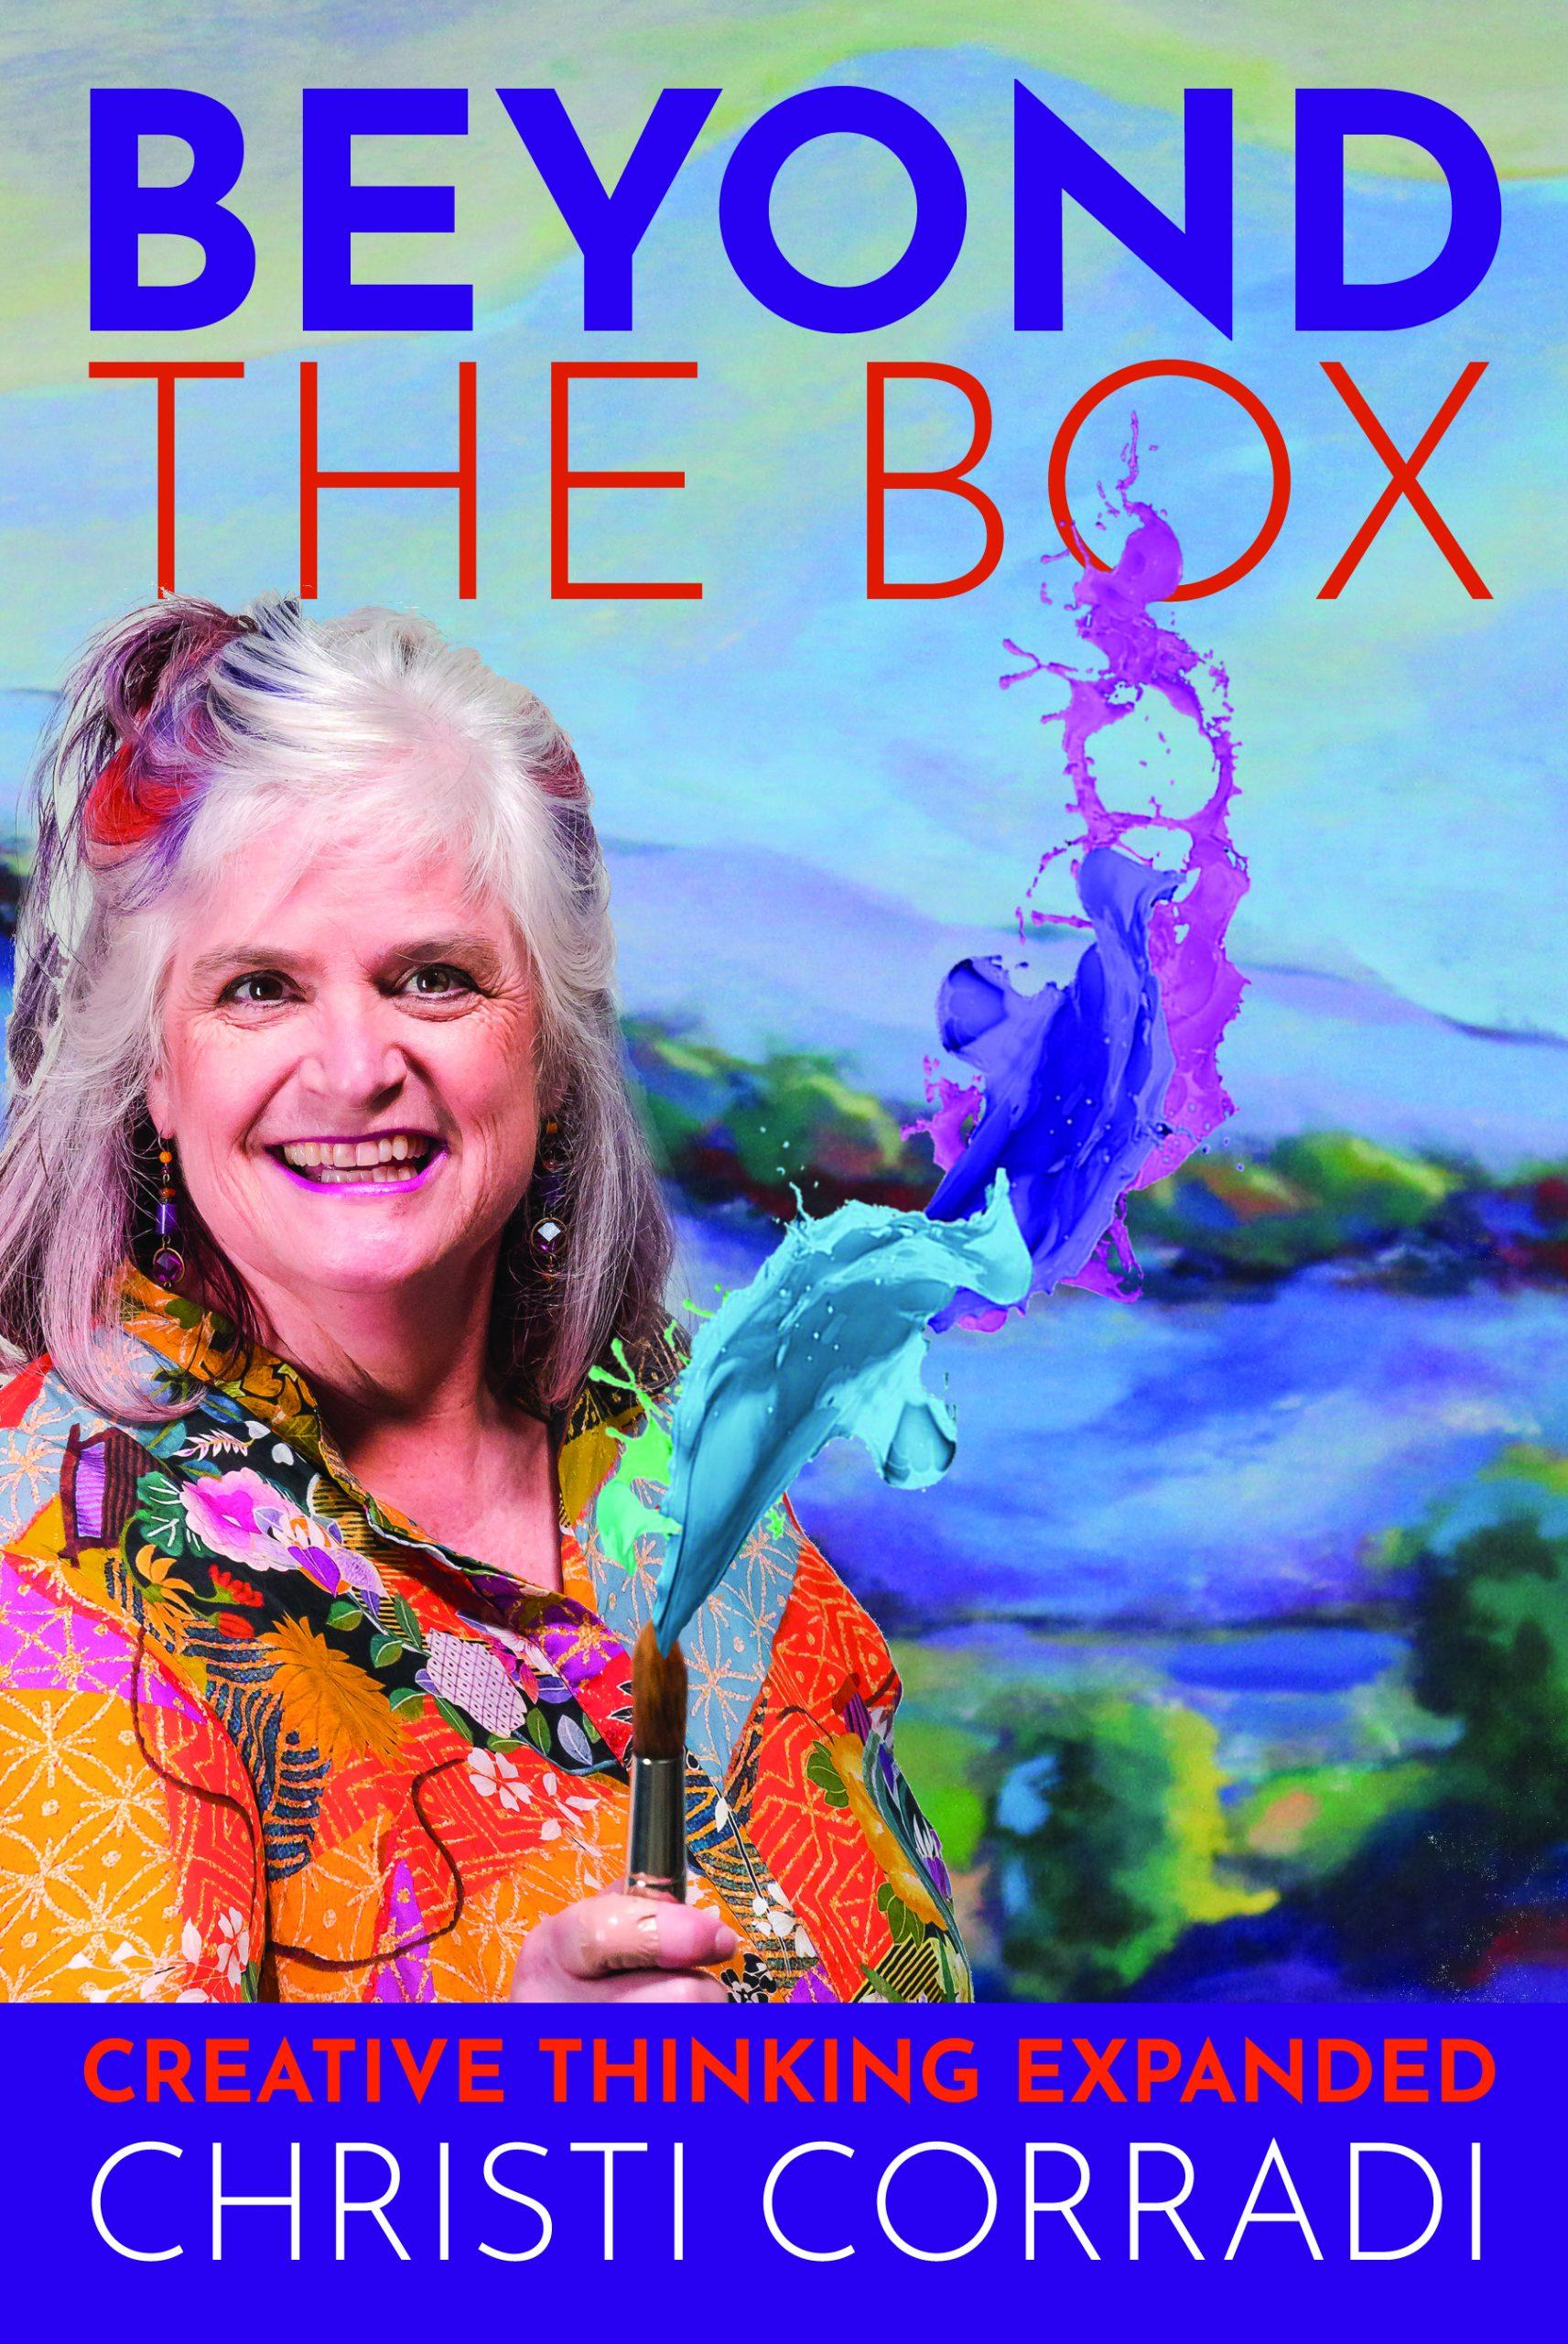 Beyonf the Box book cover art